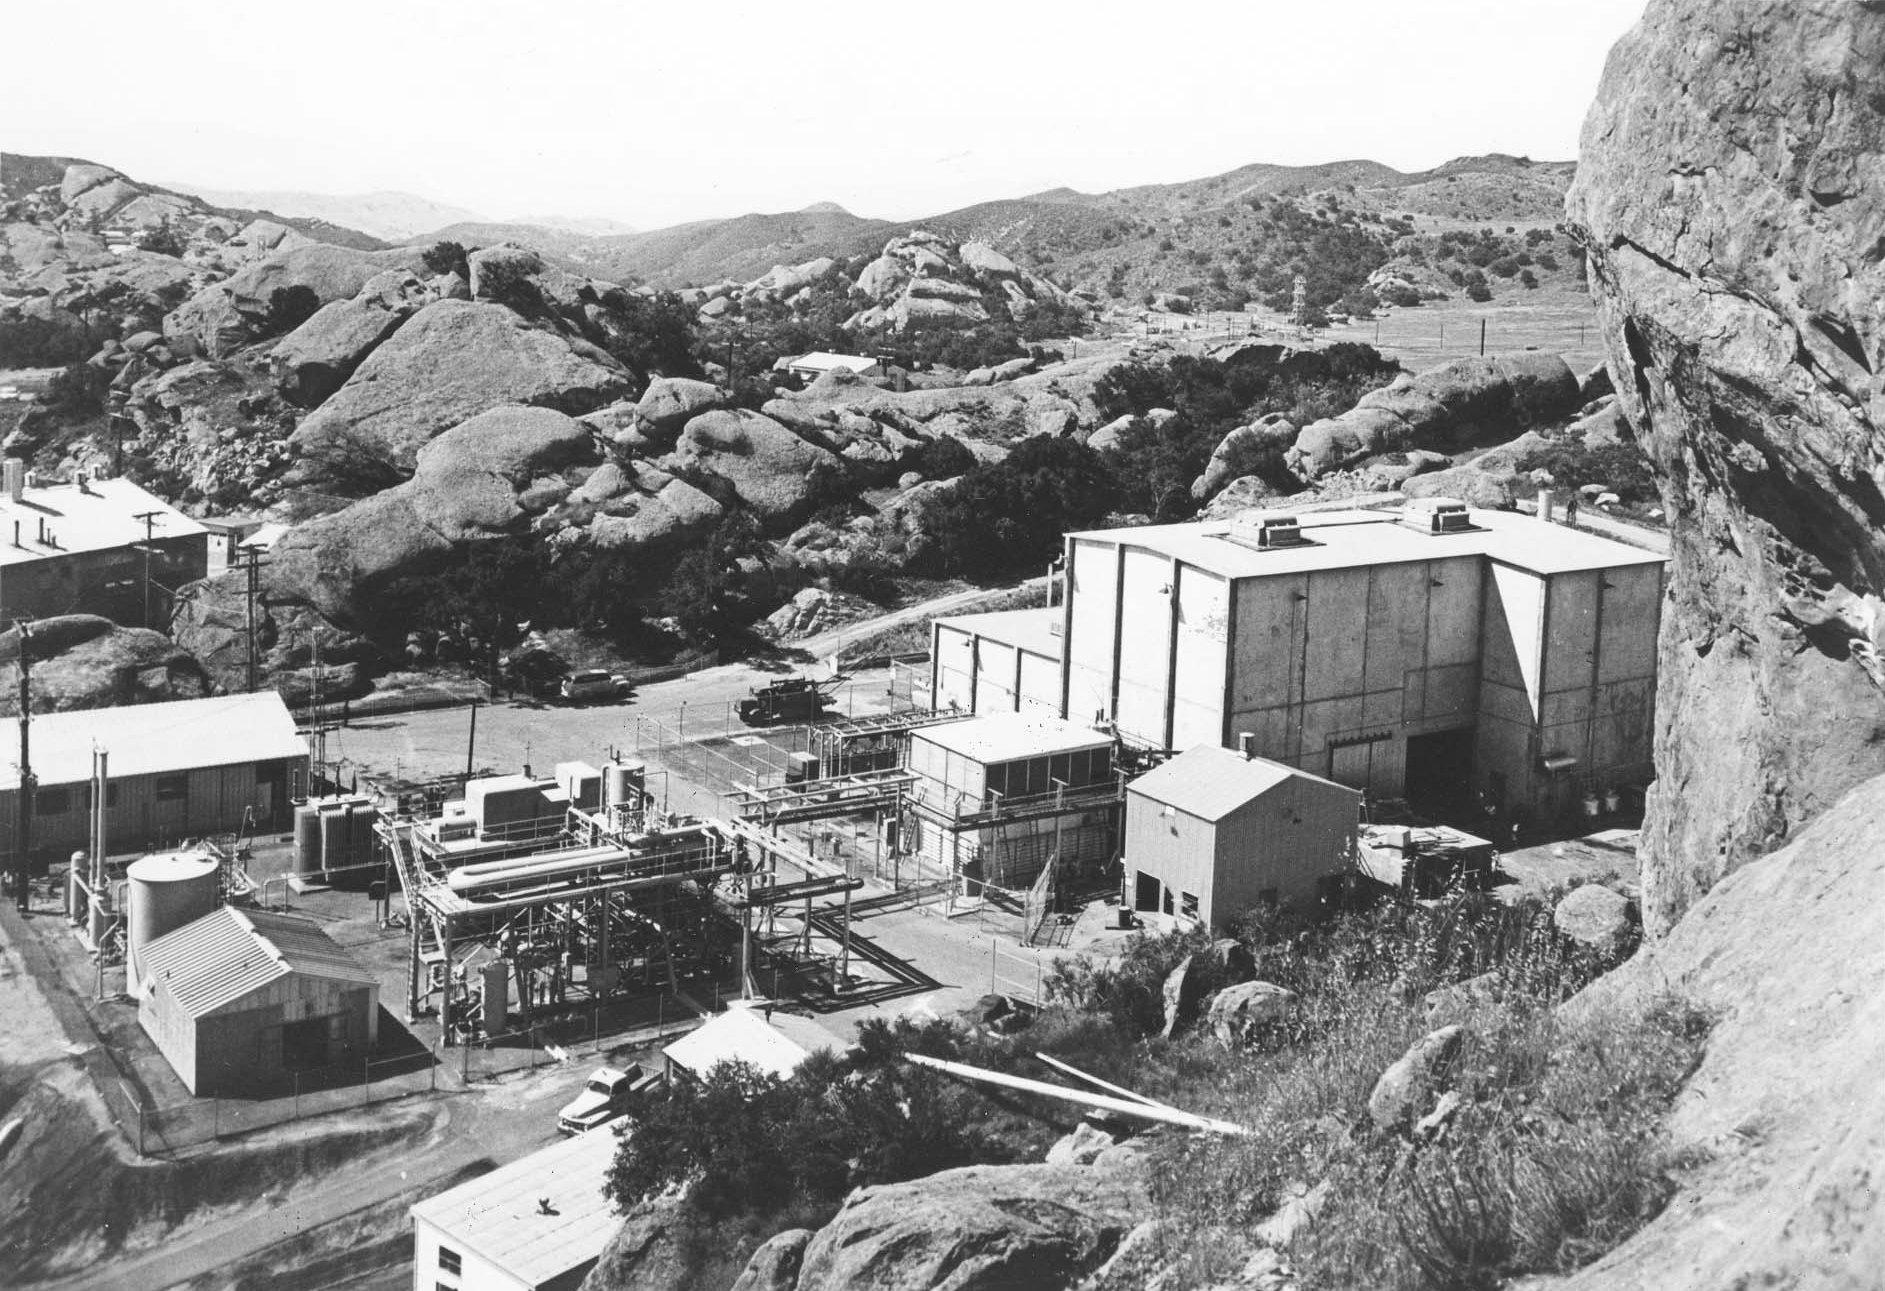 The Sodium Reactor Experiment